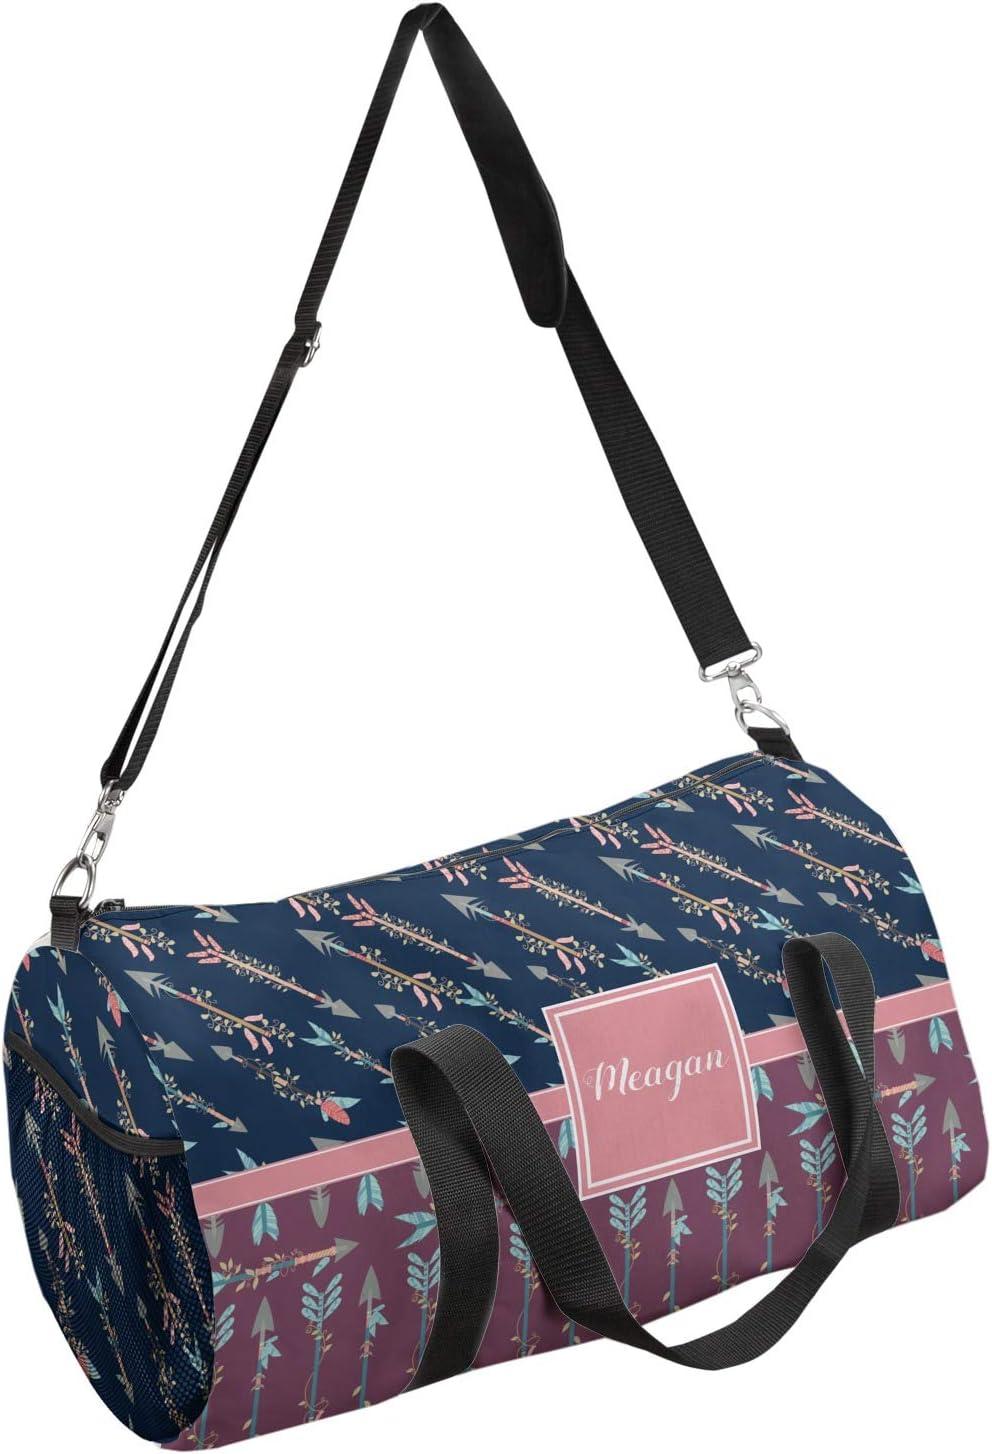 Personalized YouCustomizeIt Tribal Arrows Duffel Bag